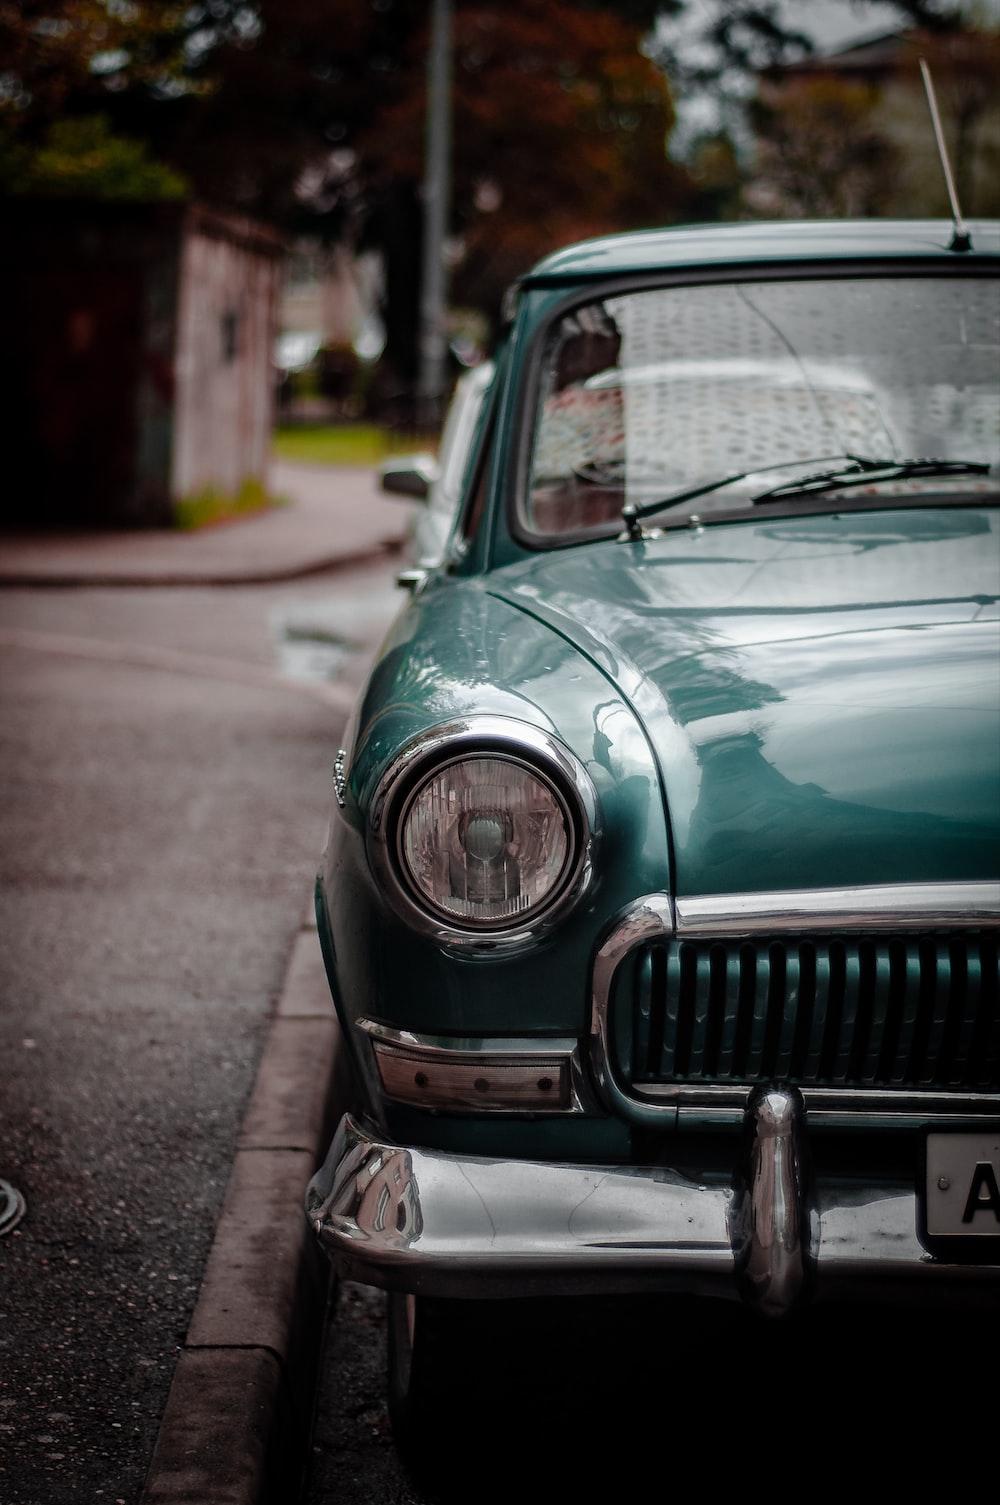 Vintage Green Vehicle Parked On Sidewalk Photo Free